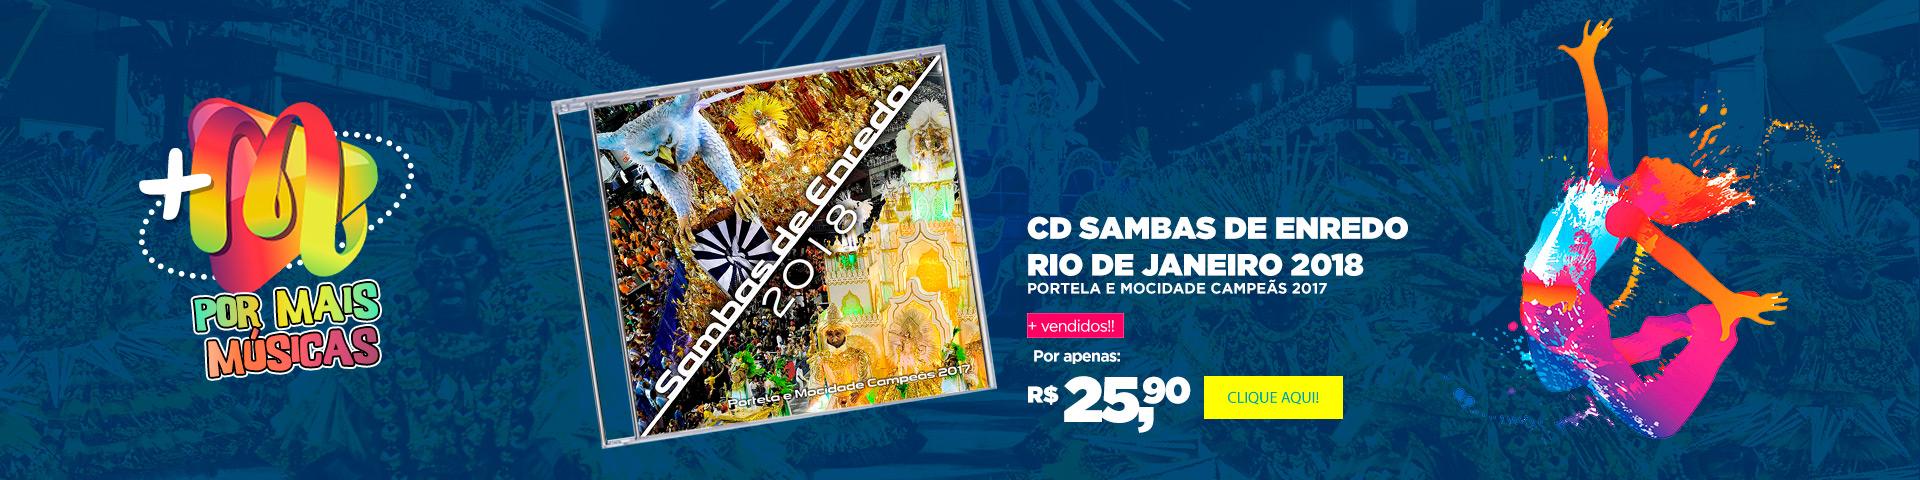 Sambas de Enredo 2018